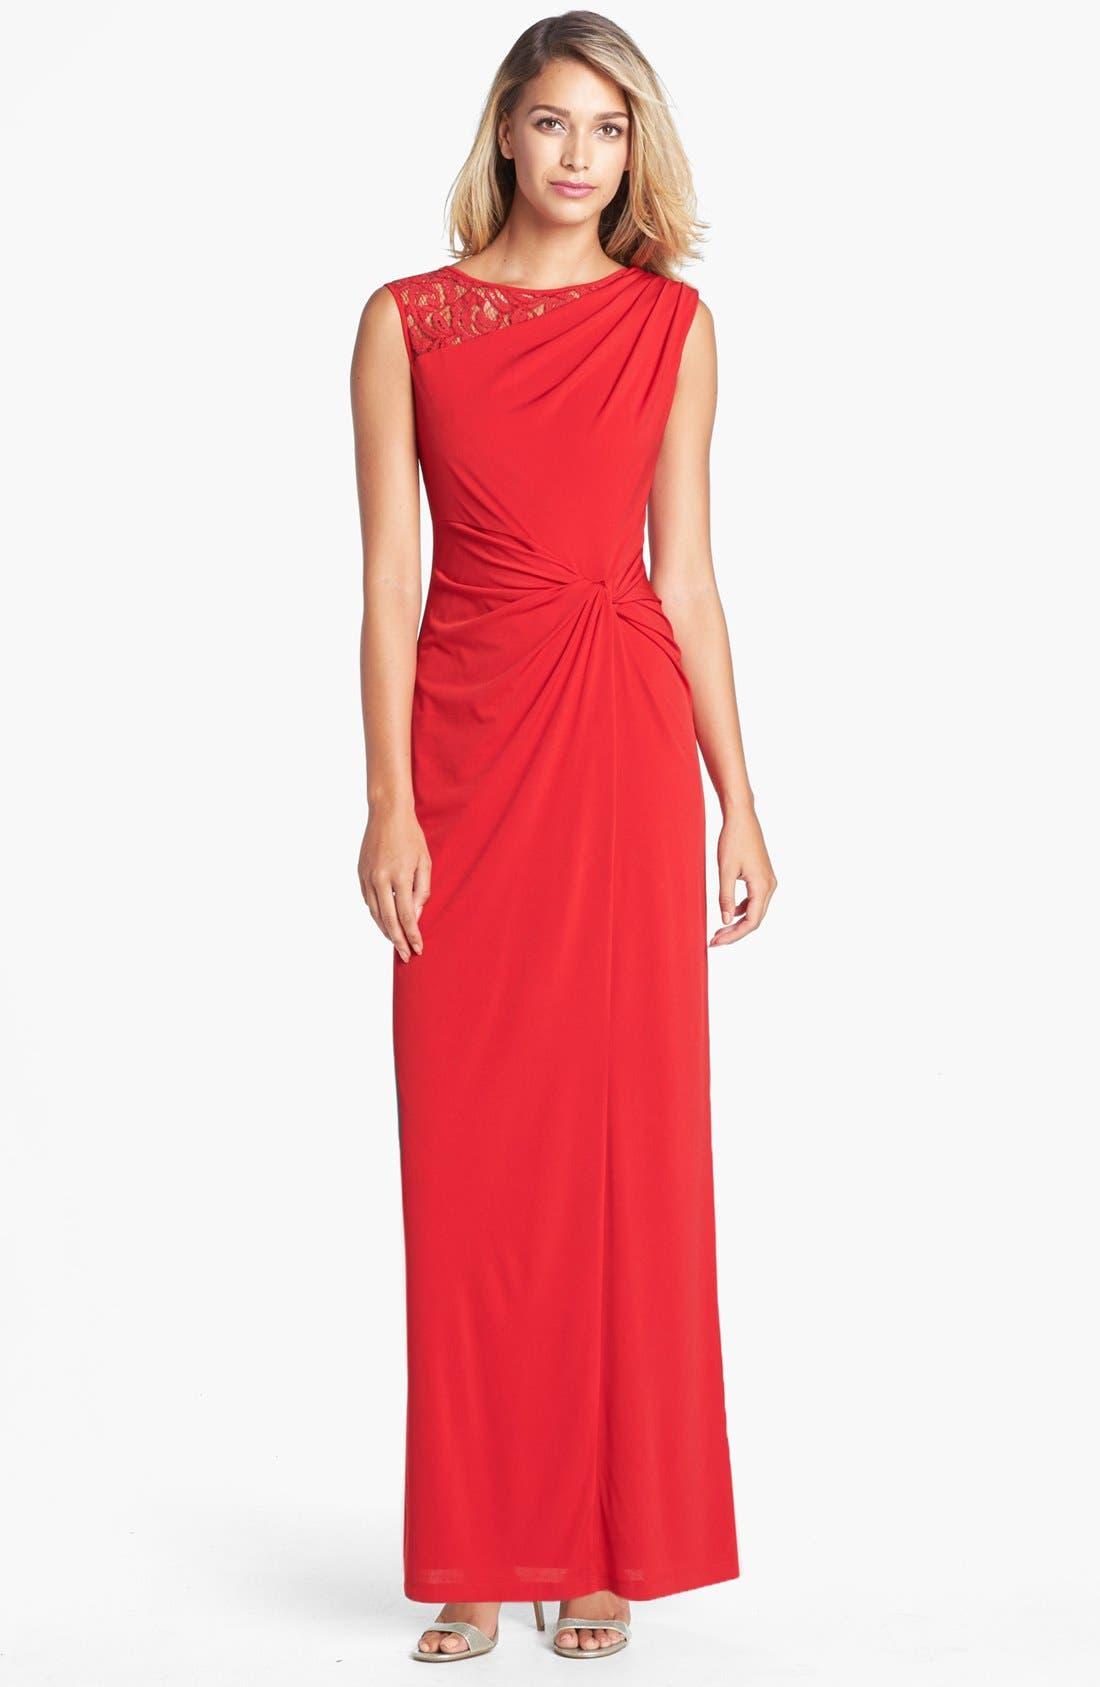 Alternate Image 1 Selected - Ellen Tracy Lace Yoke Side Knot Jersey Gown